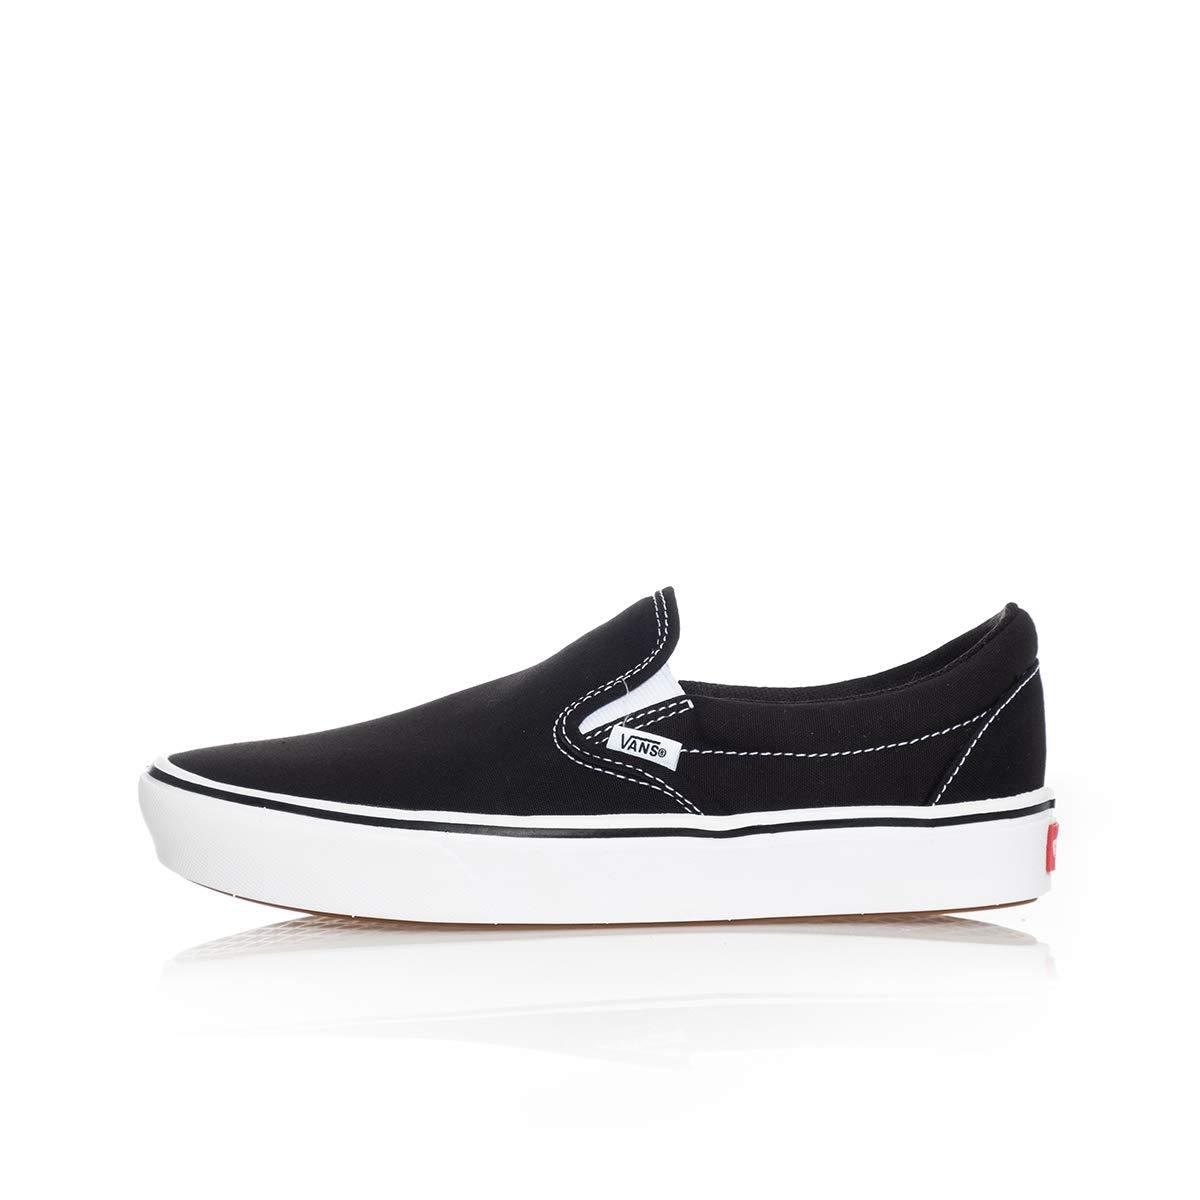 vans UA ComfyCush Slip On (Classic) blacktrue white bei